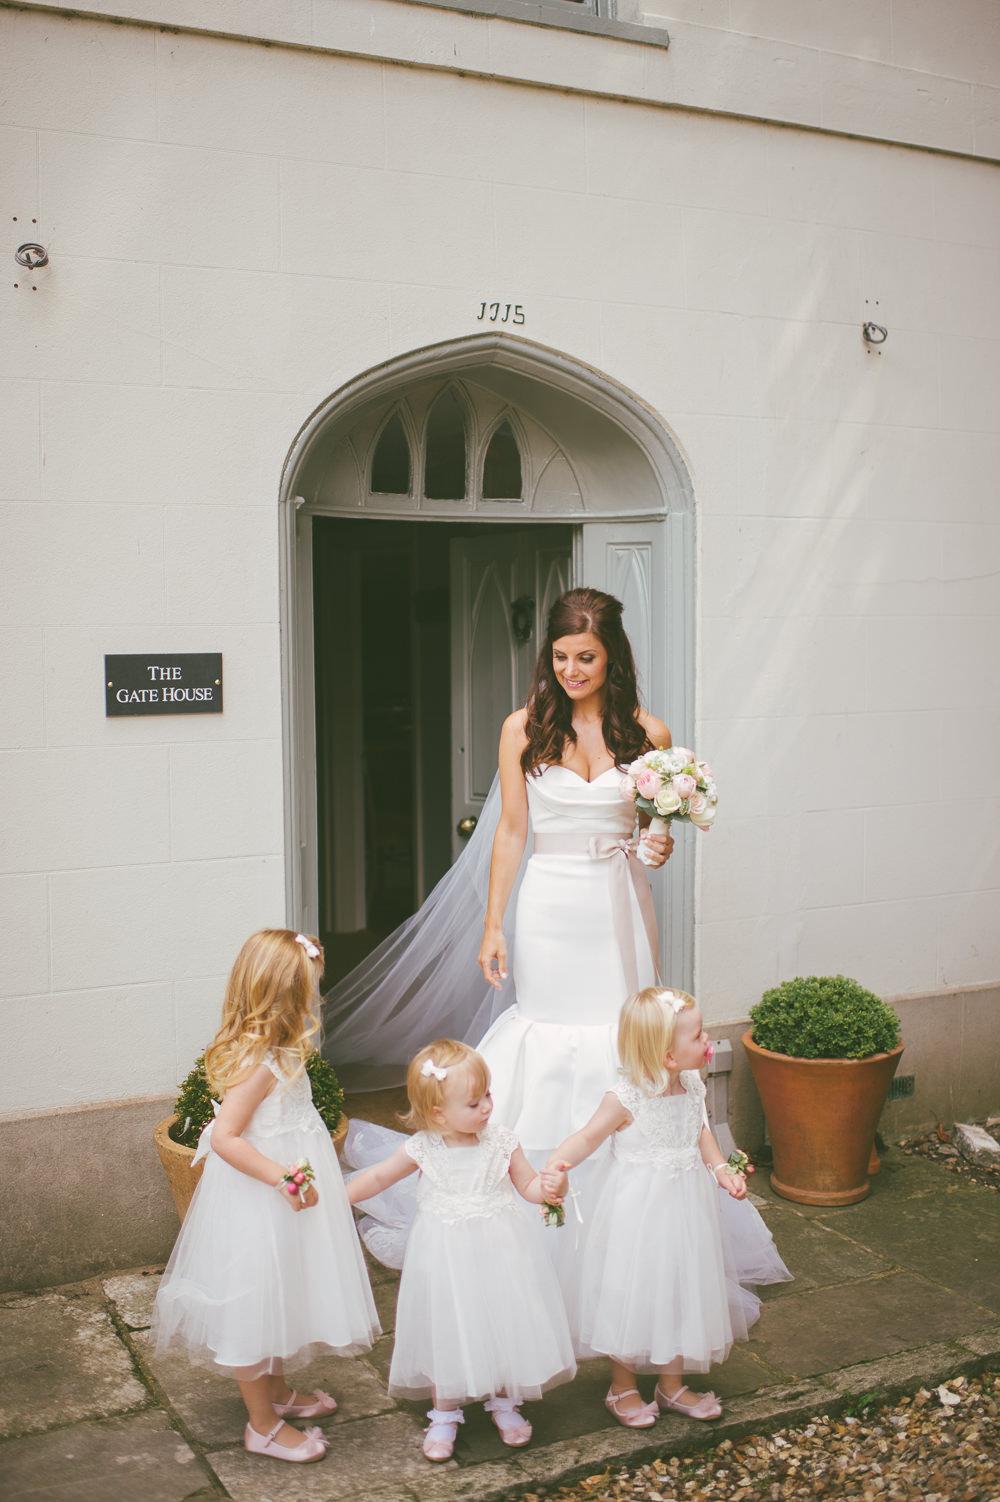 Fuchsia Pink Bridesmaids Dresses Vera Wang Bridal Gown